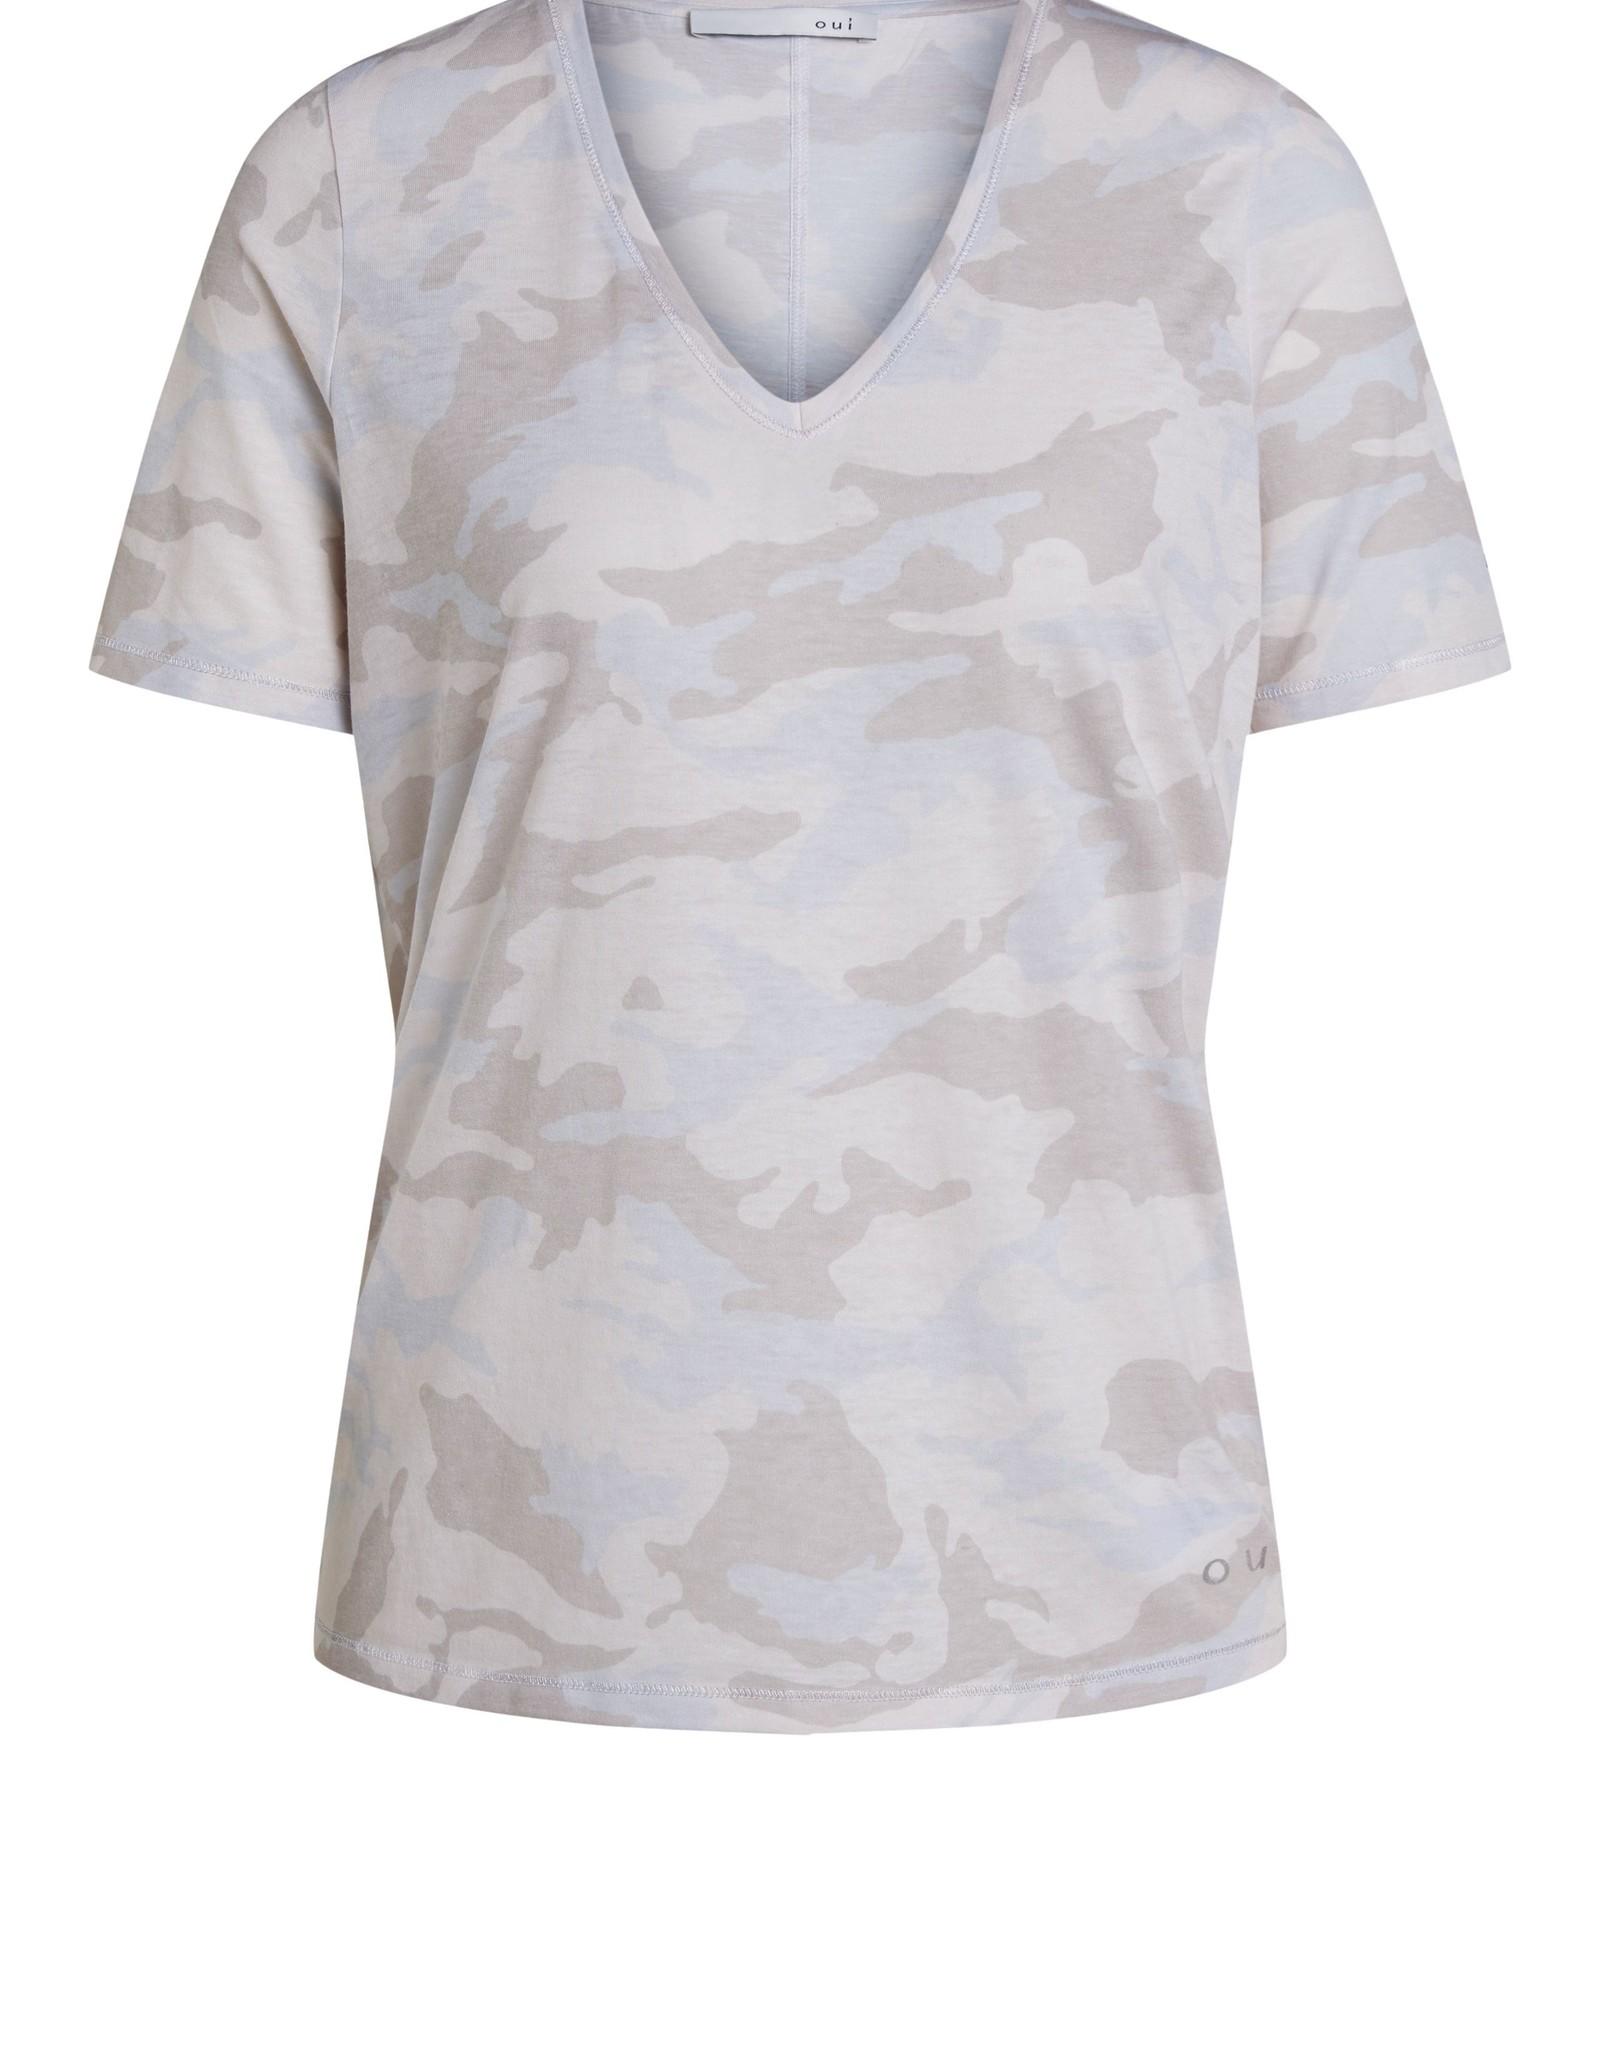 Oui T-Shirt V Hals All Over Print